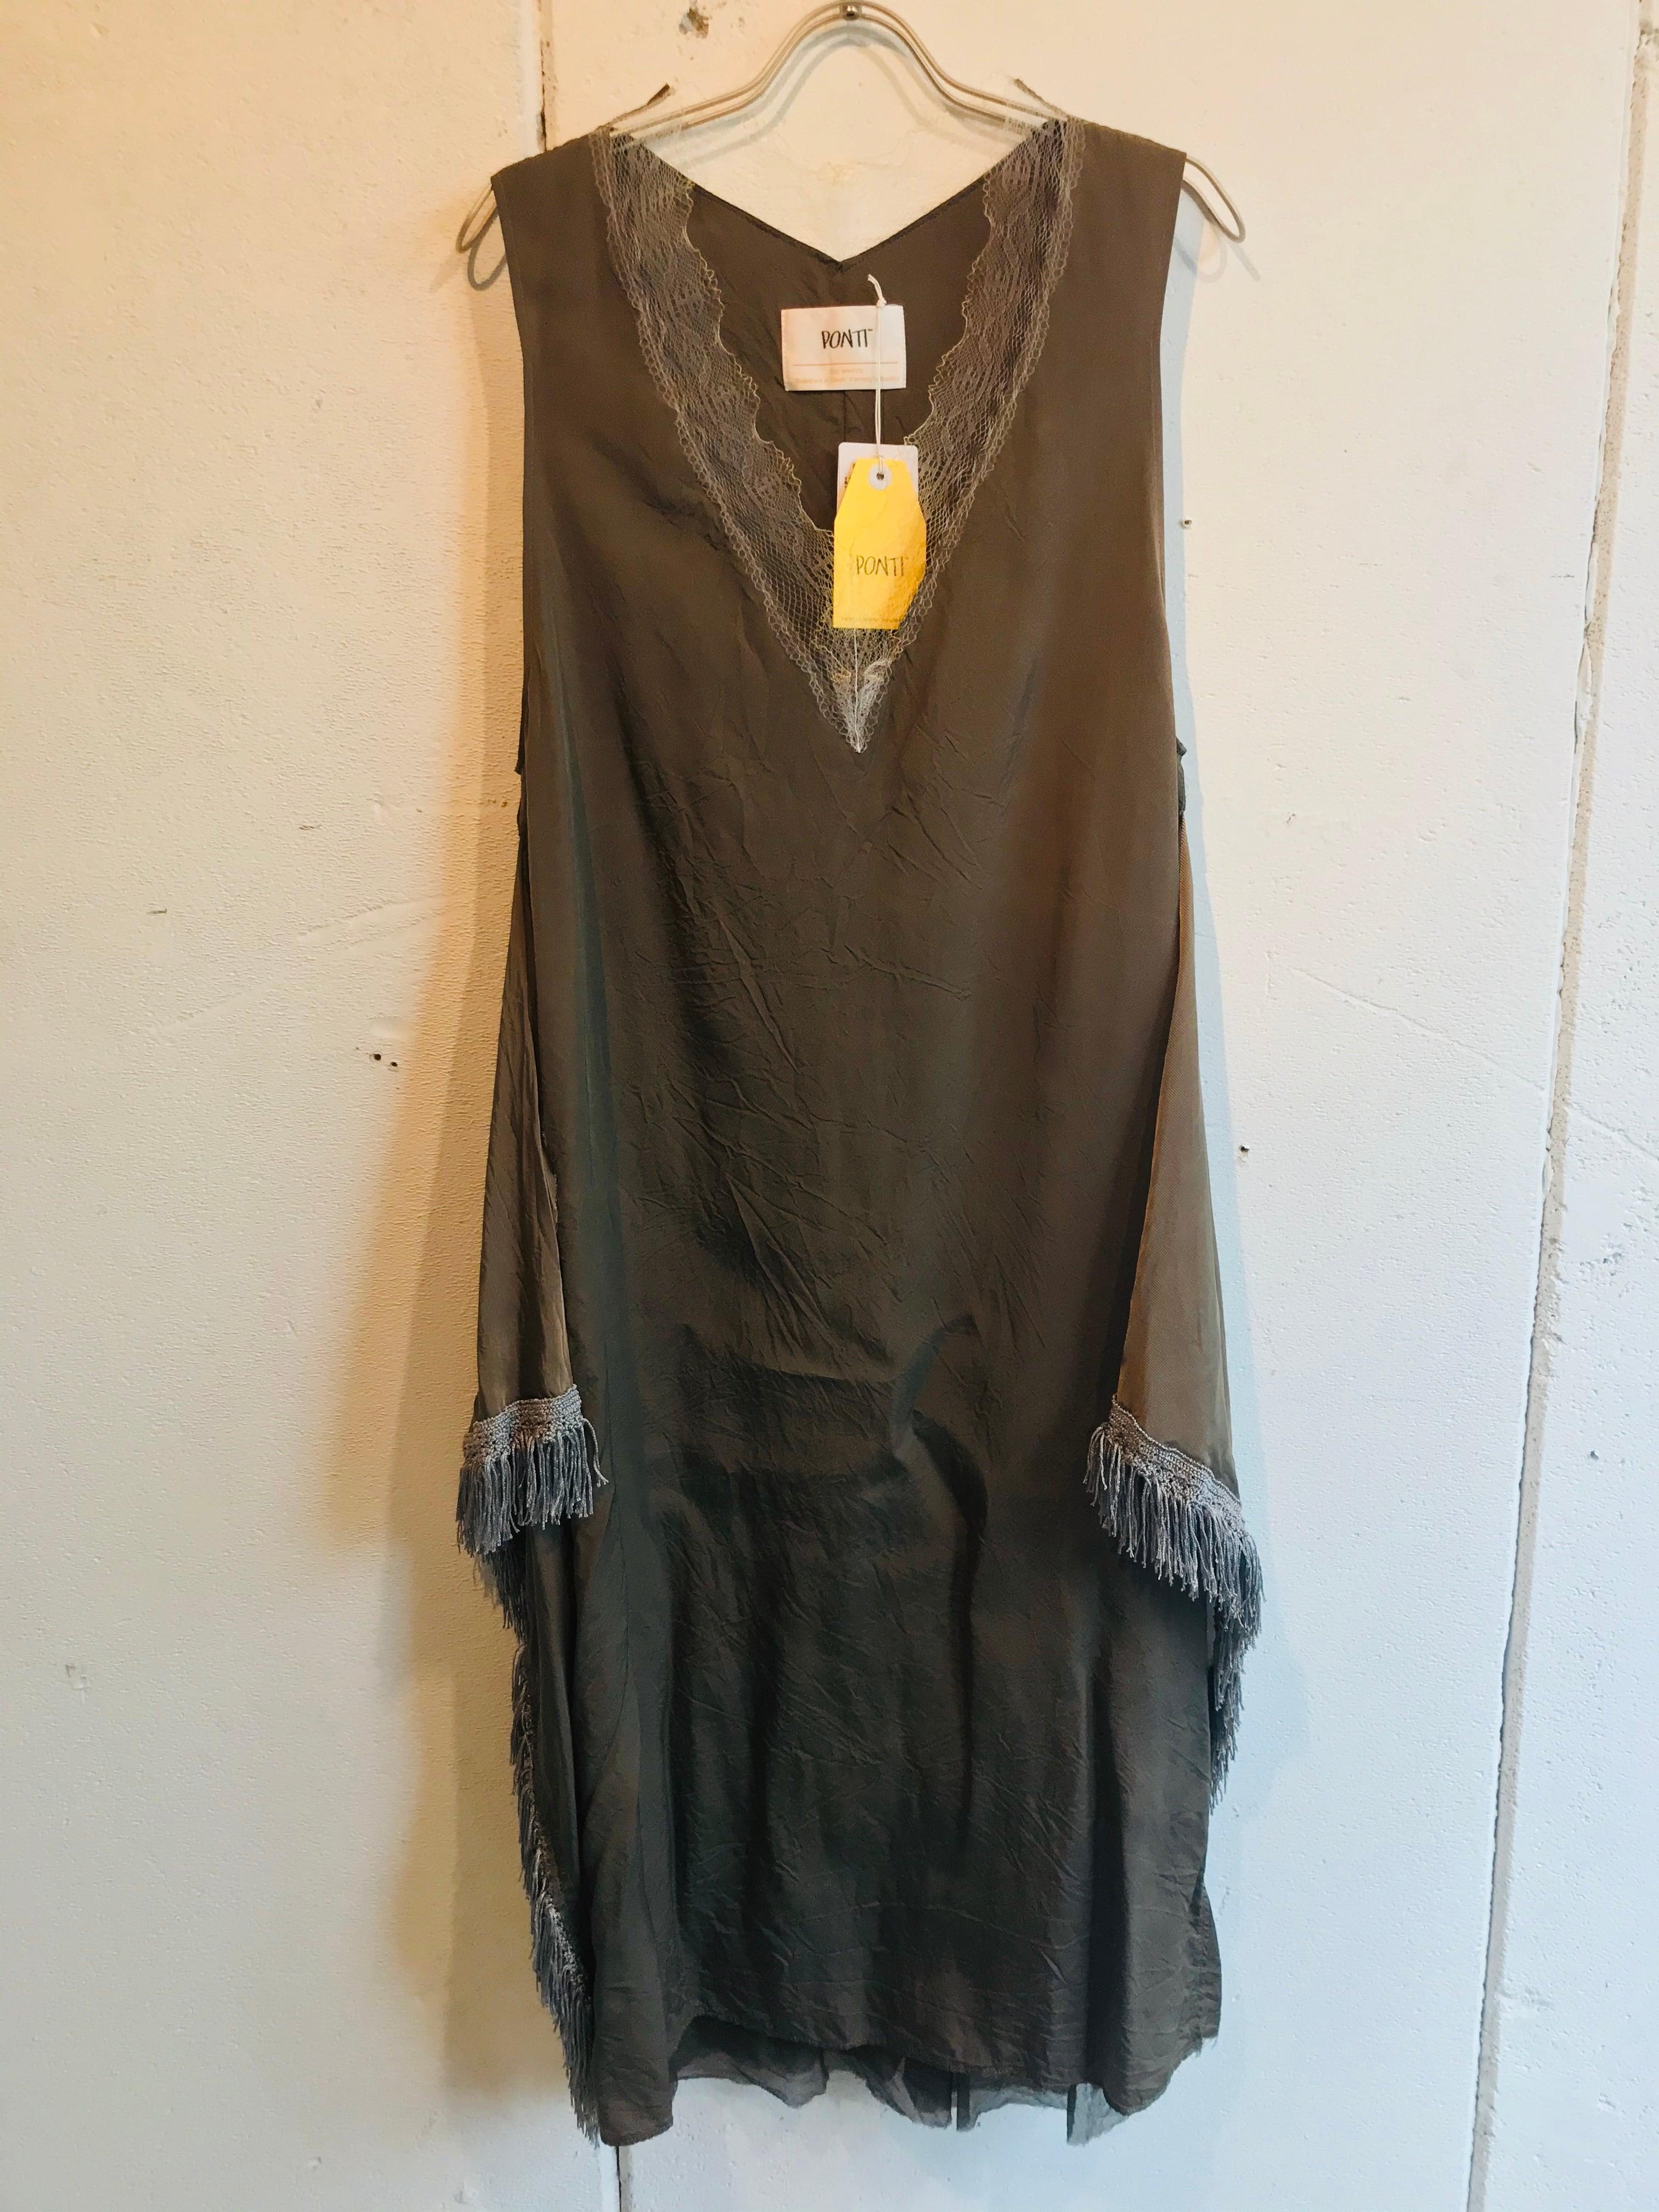 PONTI  lace combination dress